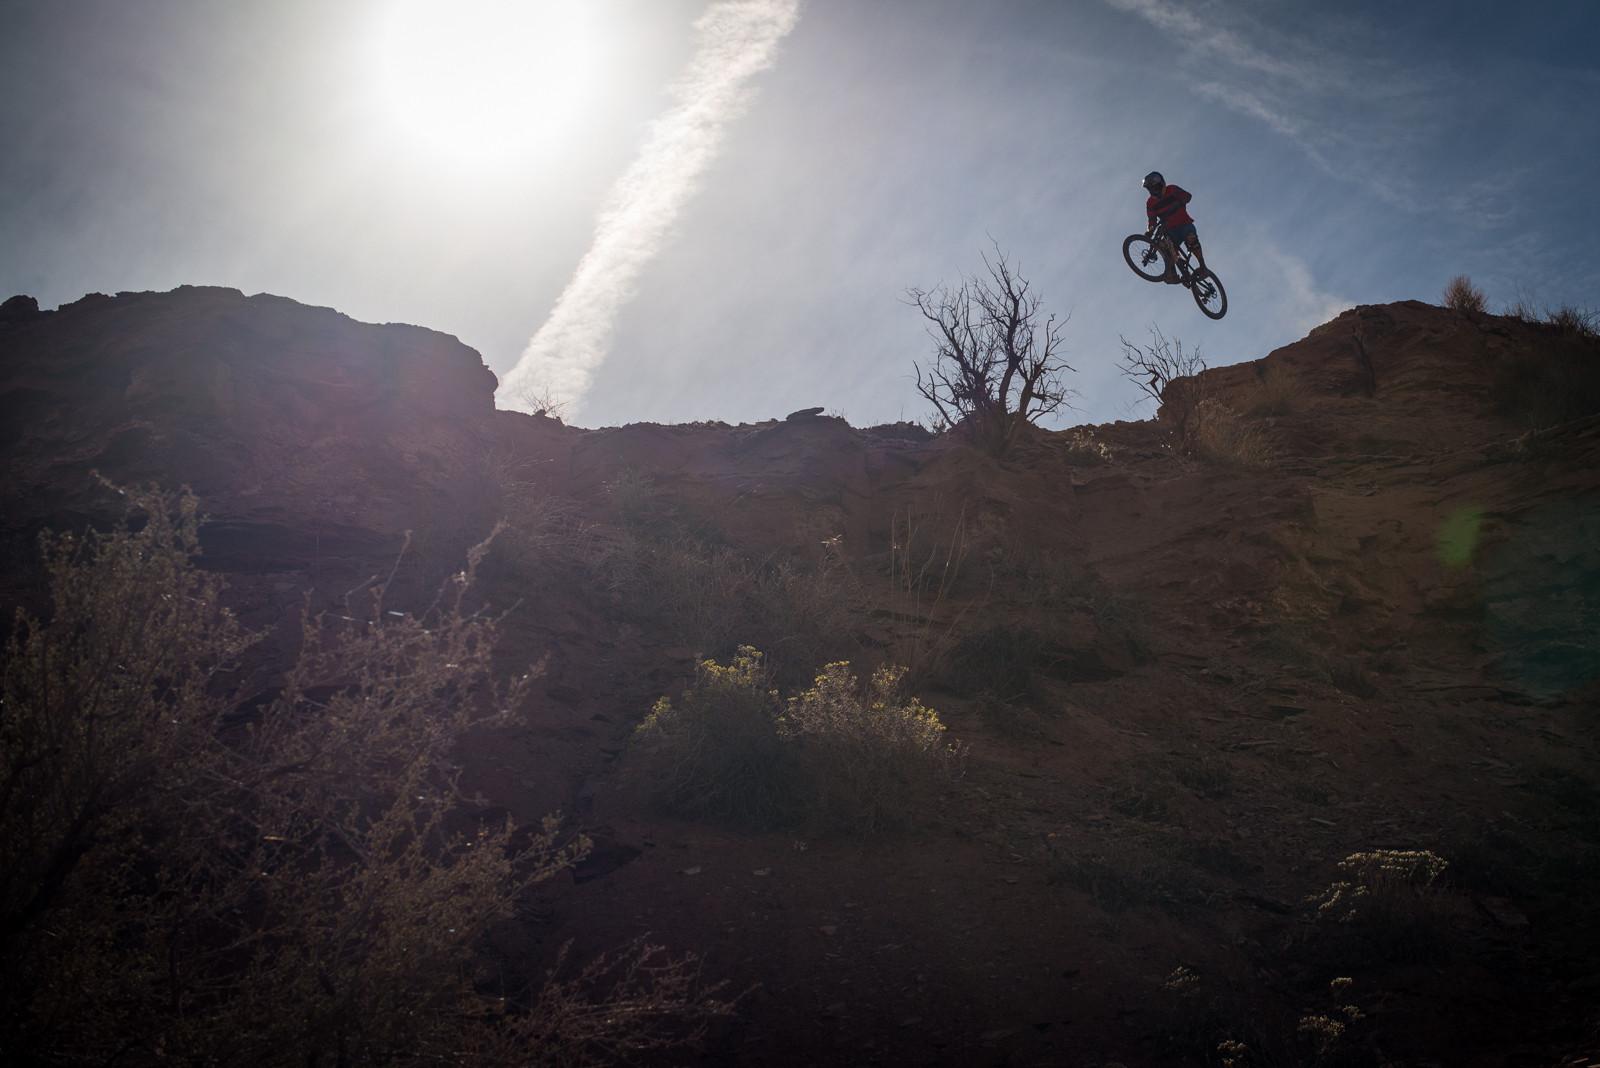 Darren Berrecloth - 2015 Red Bull Rampage Finals - Mountain Biking Pictures - Vital MTB